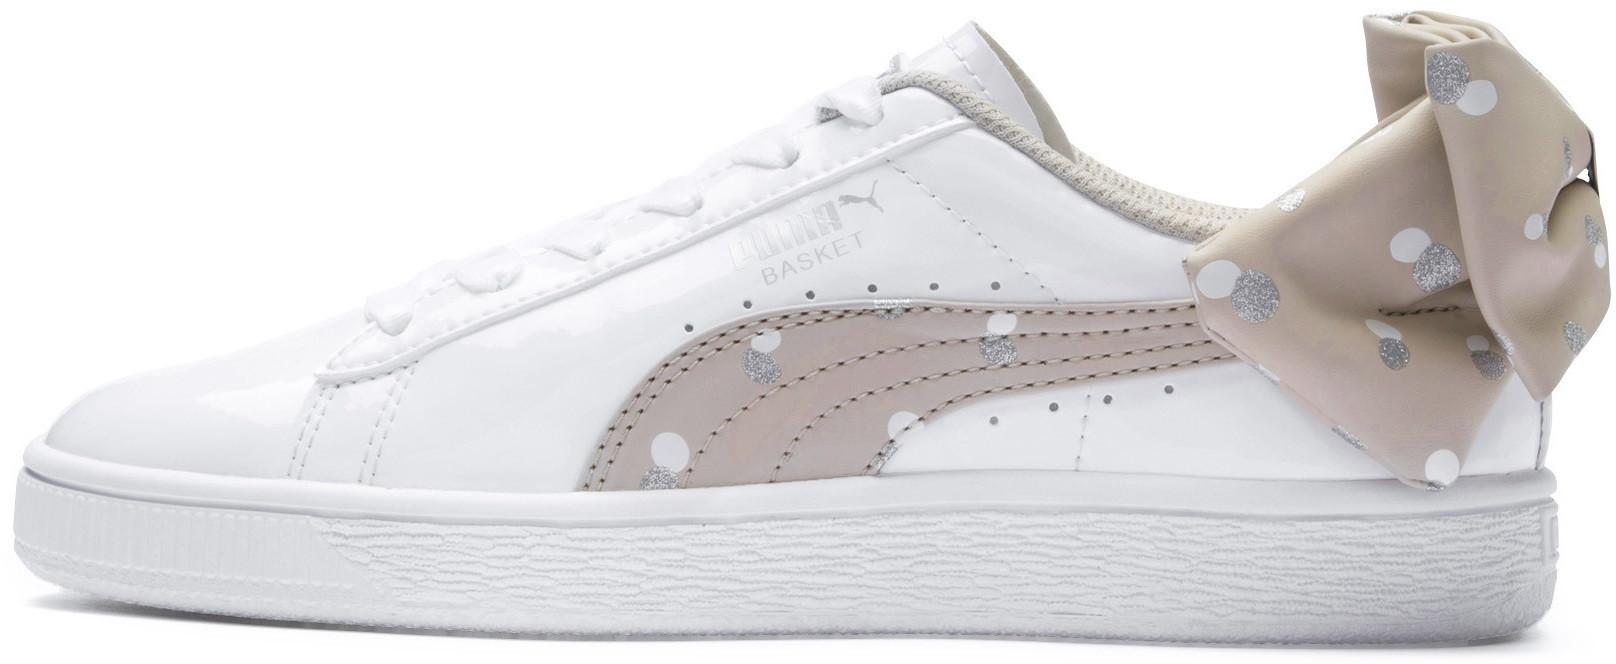 8e62cd9c7 Puma Shoes Juniors Girls Basket Bow Dots White | Sportsman24